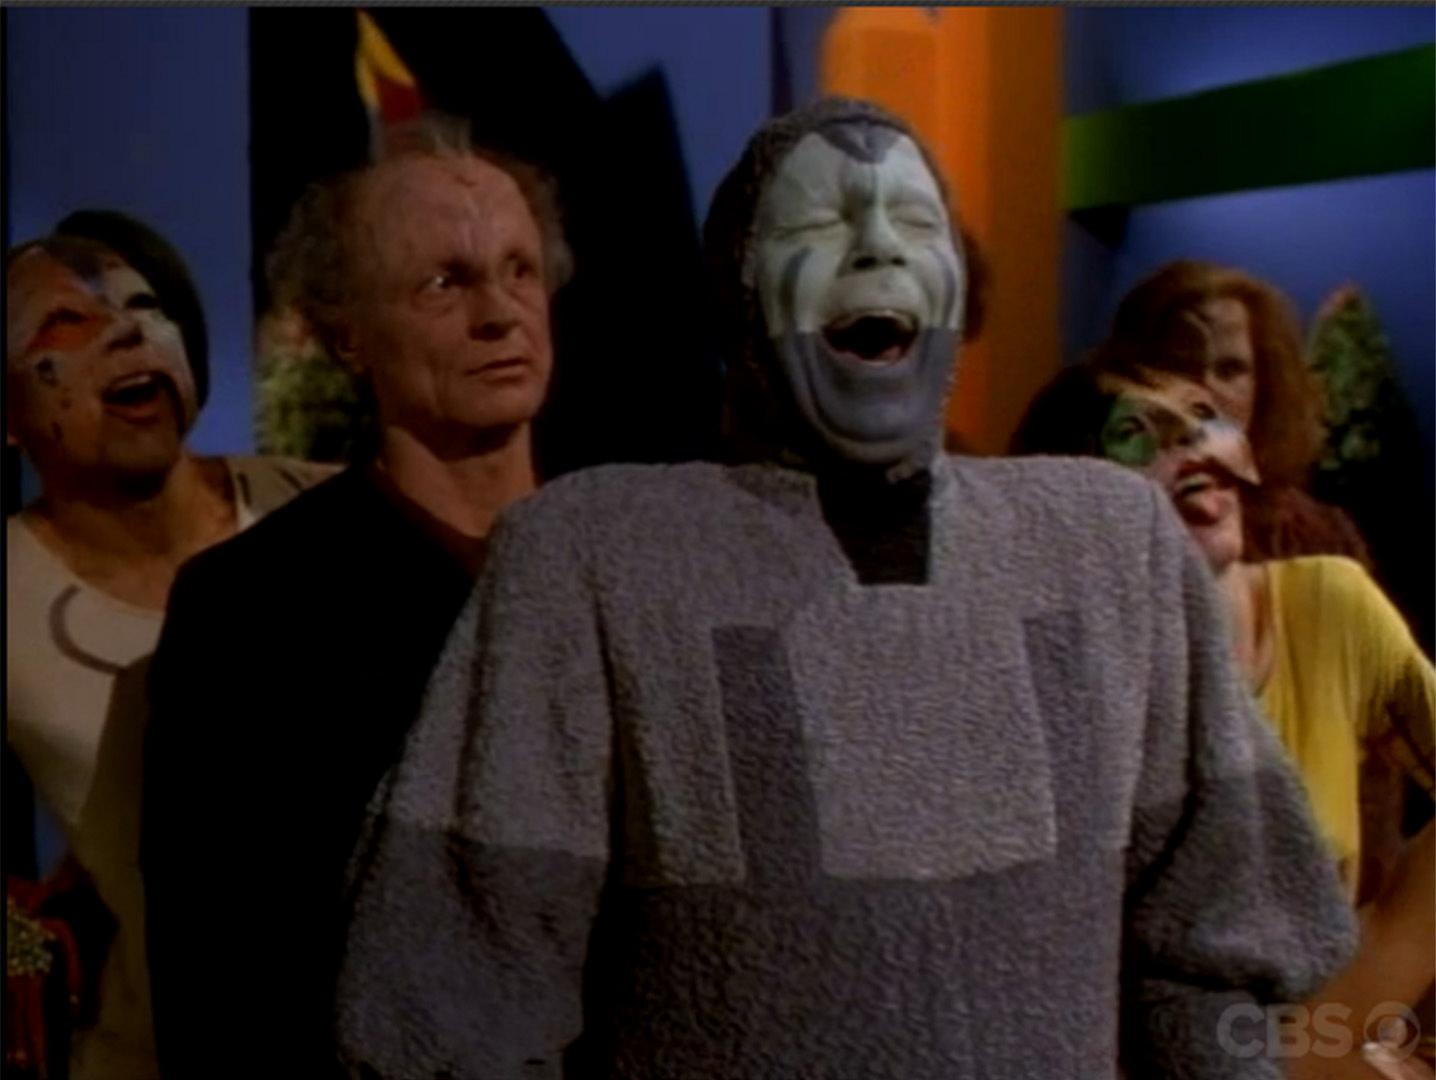 The Thaw (Star Trek: Voyager, Season 2, Episode 23)